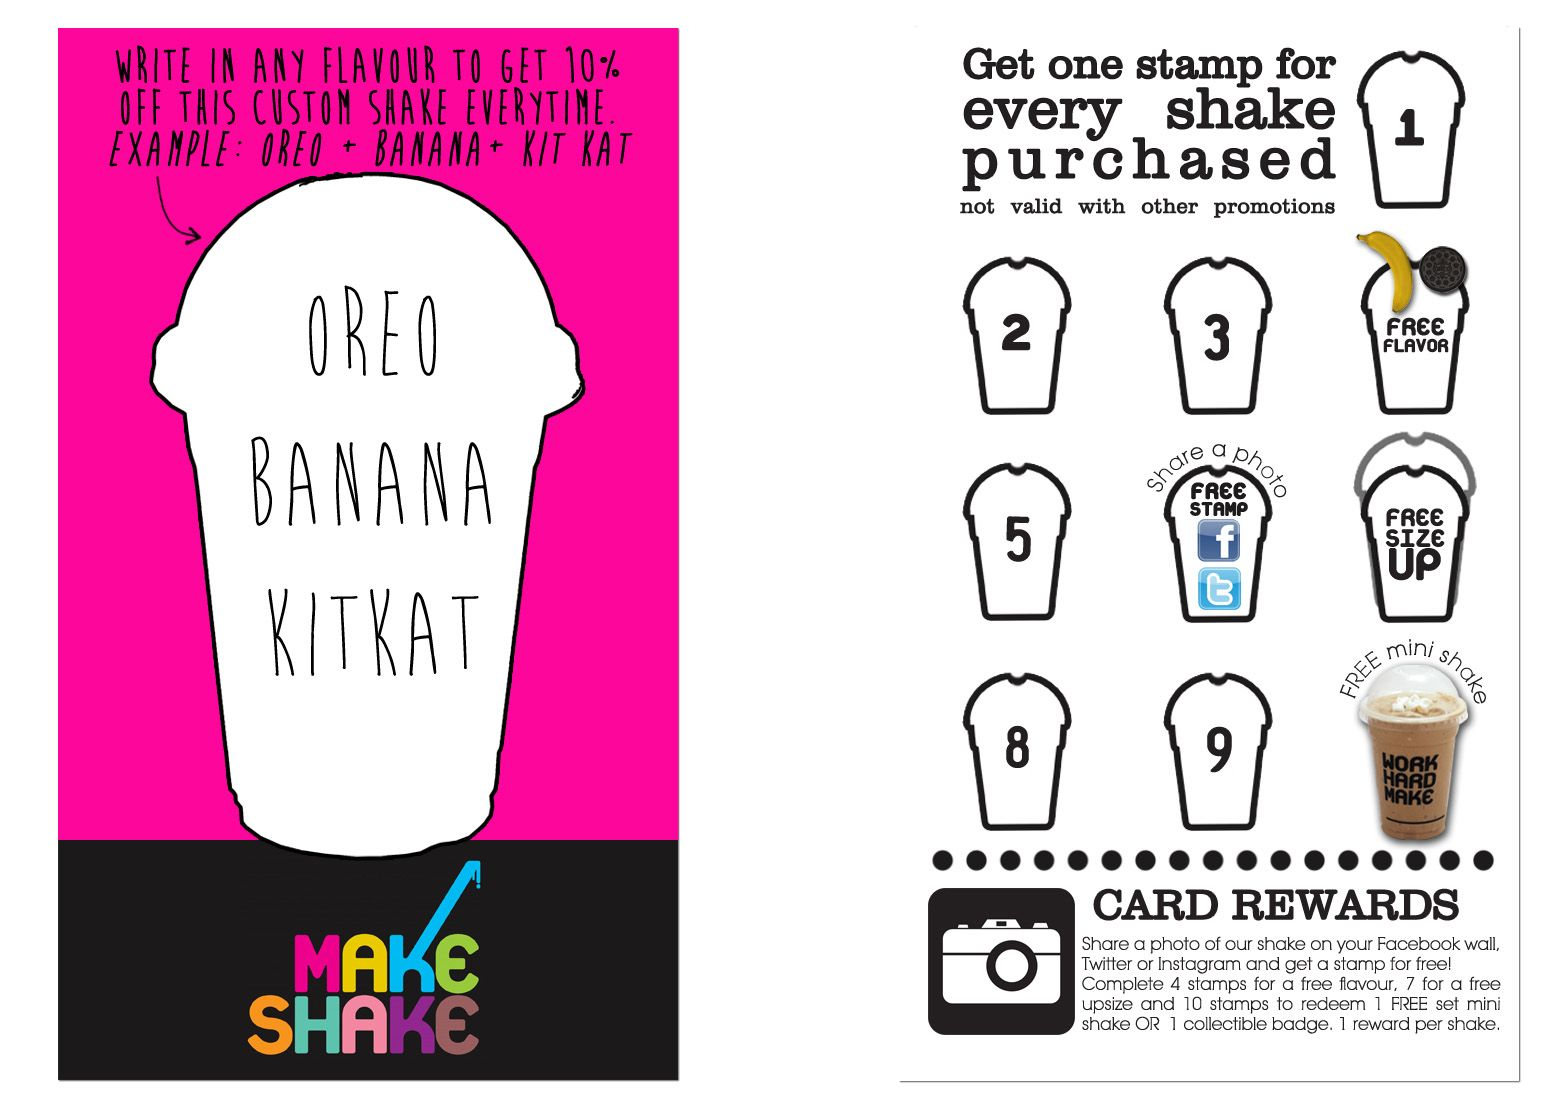 New Loyalty Stamp Card Makeshake Milkshakes Singapore S Best Dessert Stamped Cards Friend Referral Cards